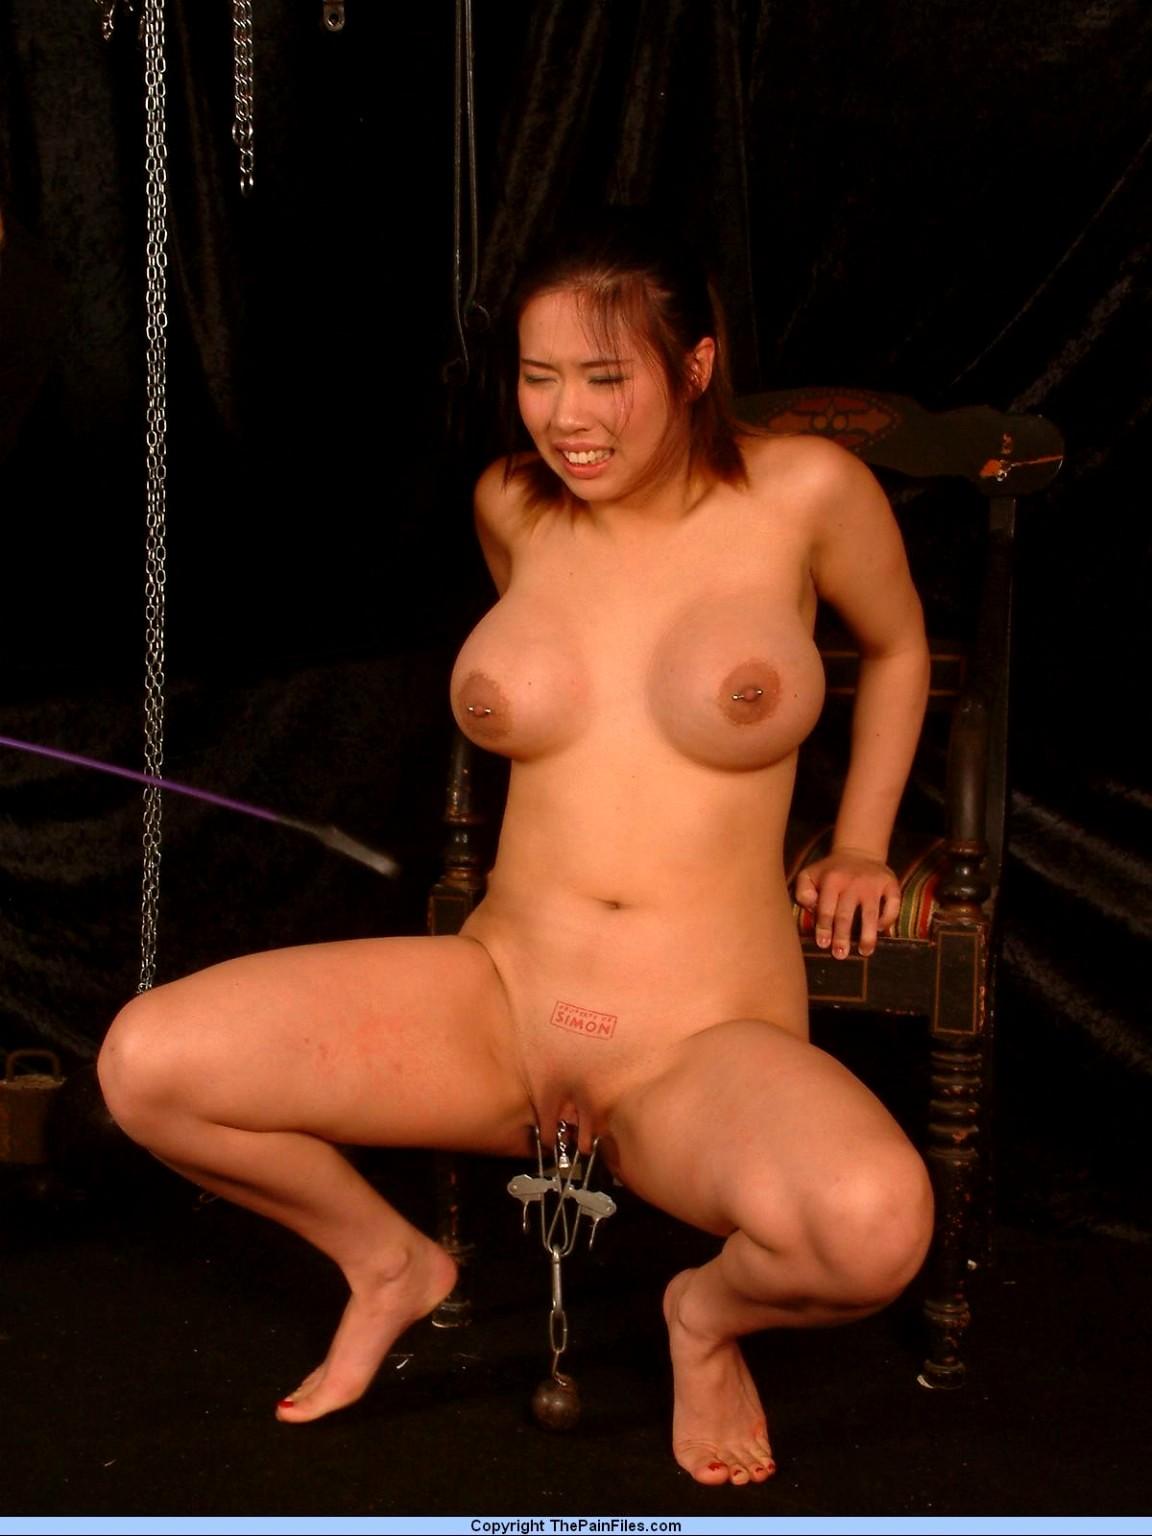 Sex Hd Mobile Pics The Pain Files Tiger Benson Interactive -7644